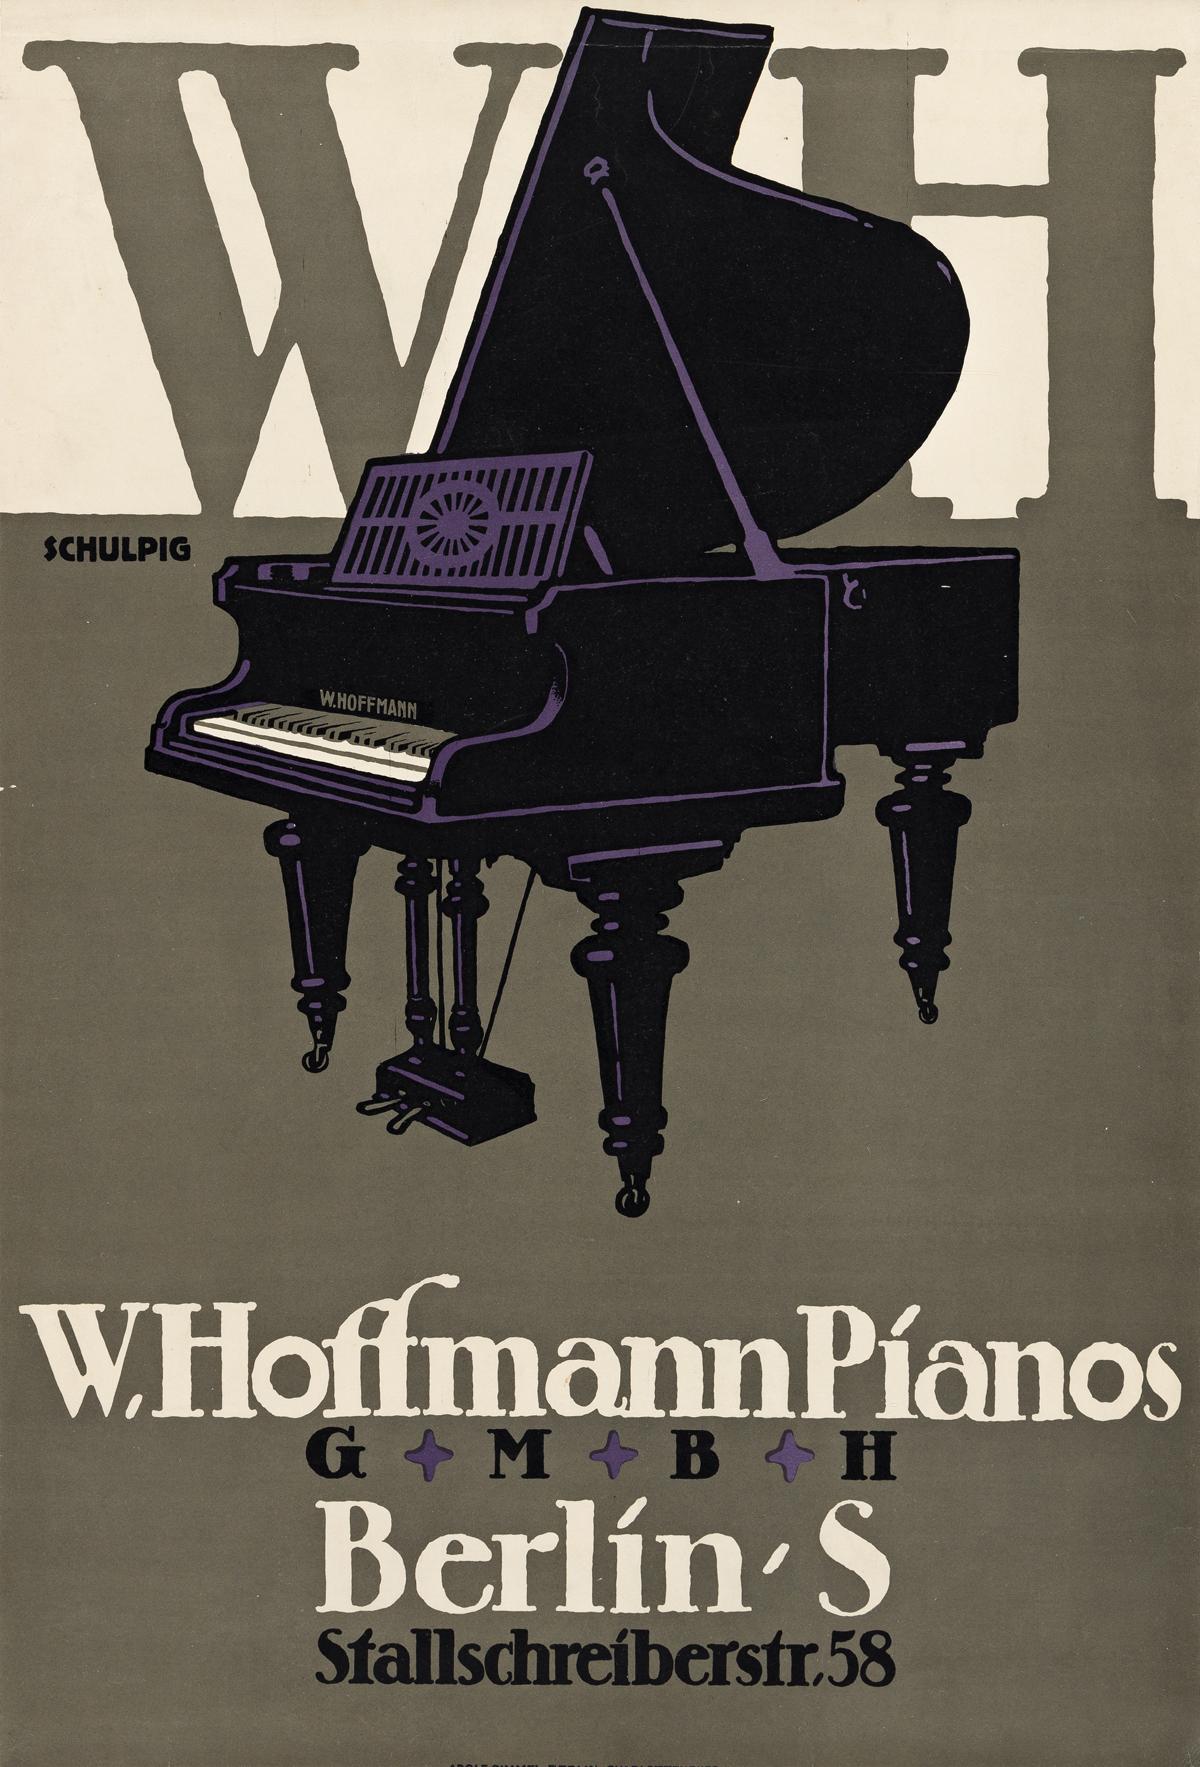 KARL SCHULPIG (1884-1948).  W. HOFFMANN PIANOS. 1912. 27x18¼ inches, 68½x46¼ cm. Adolf Simmel, Berlin.